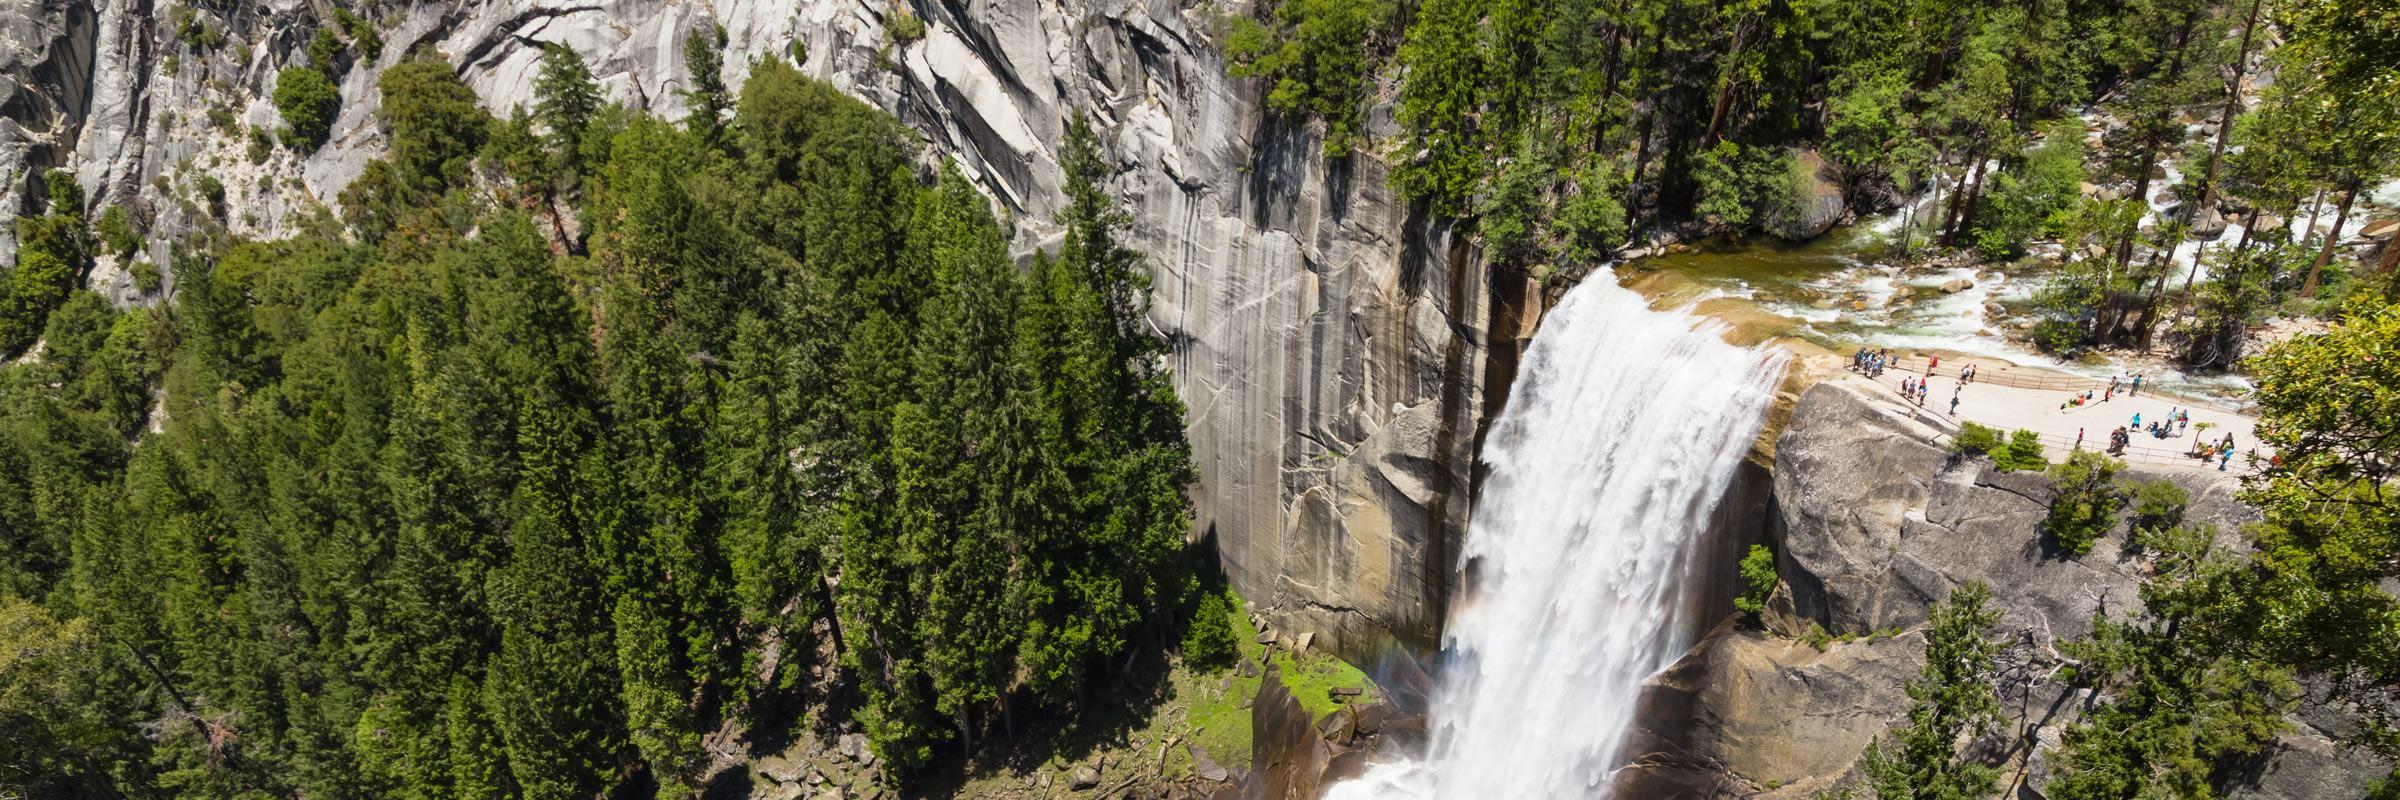 The spectacular 317 ft (96 m) high Vernal Falls